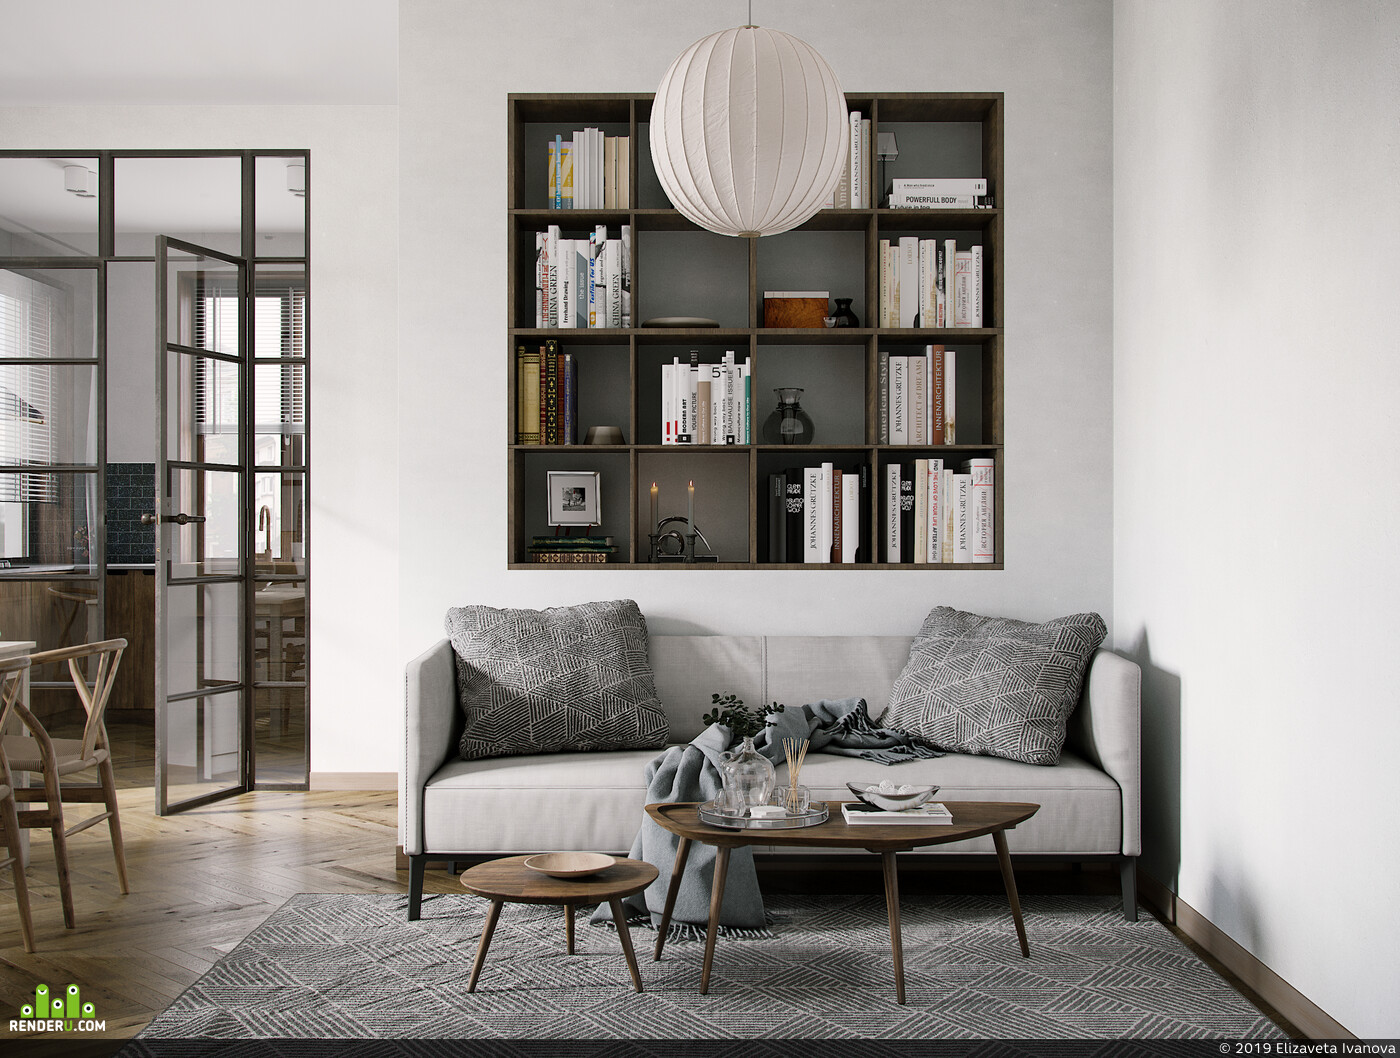 3ds Max, coronarenderer, corona render, interior design,, interiordesign, interior vizualization, visualisation interior corona